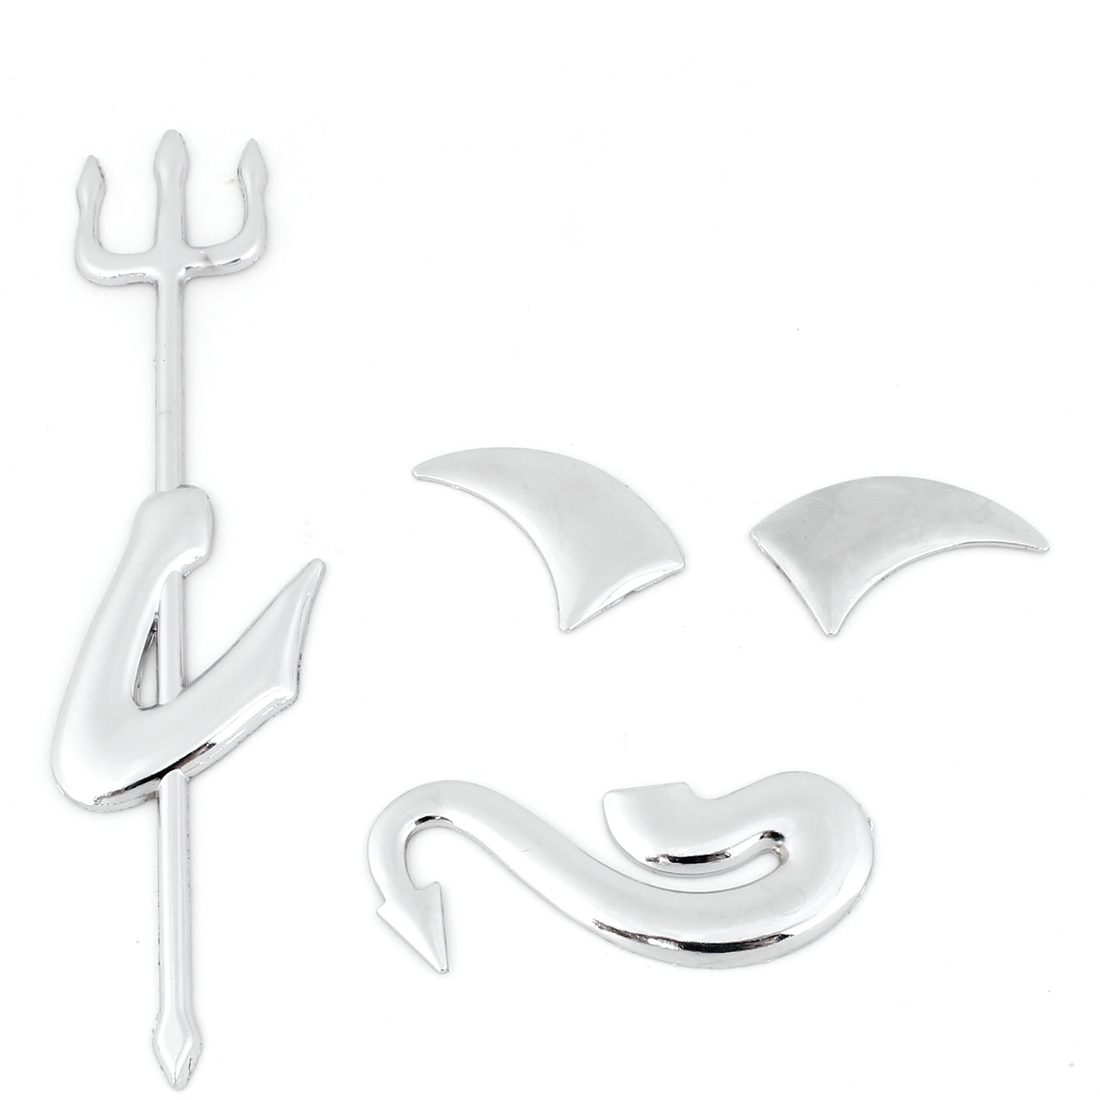 4 in 1 Silver Tone Plastic Demon Design Badge Emblem Sticker Ornament for Car